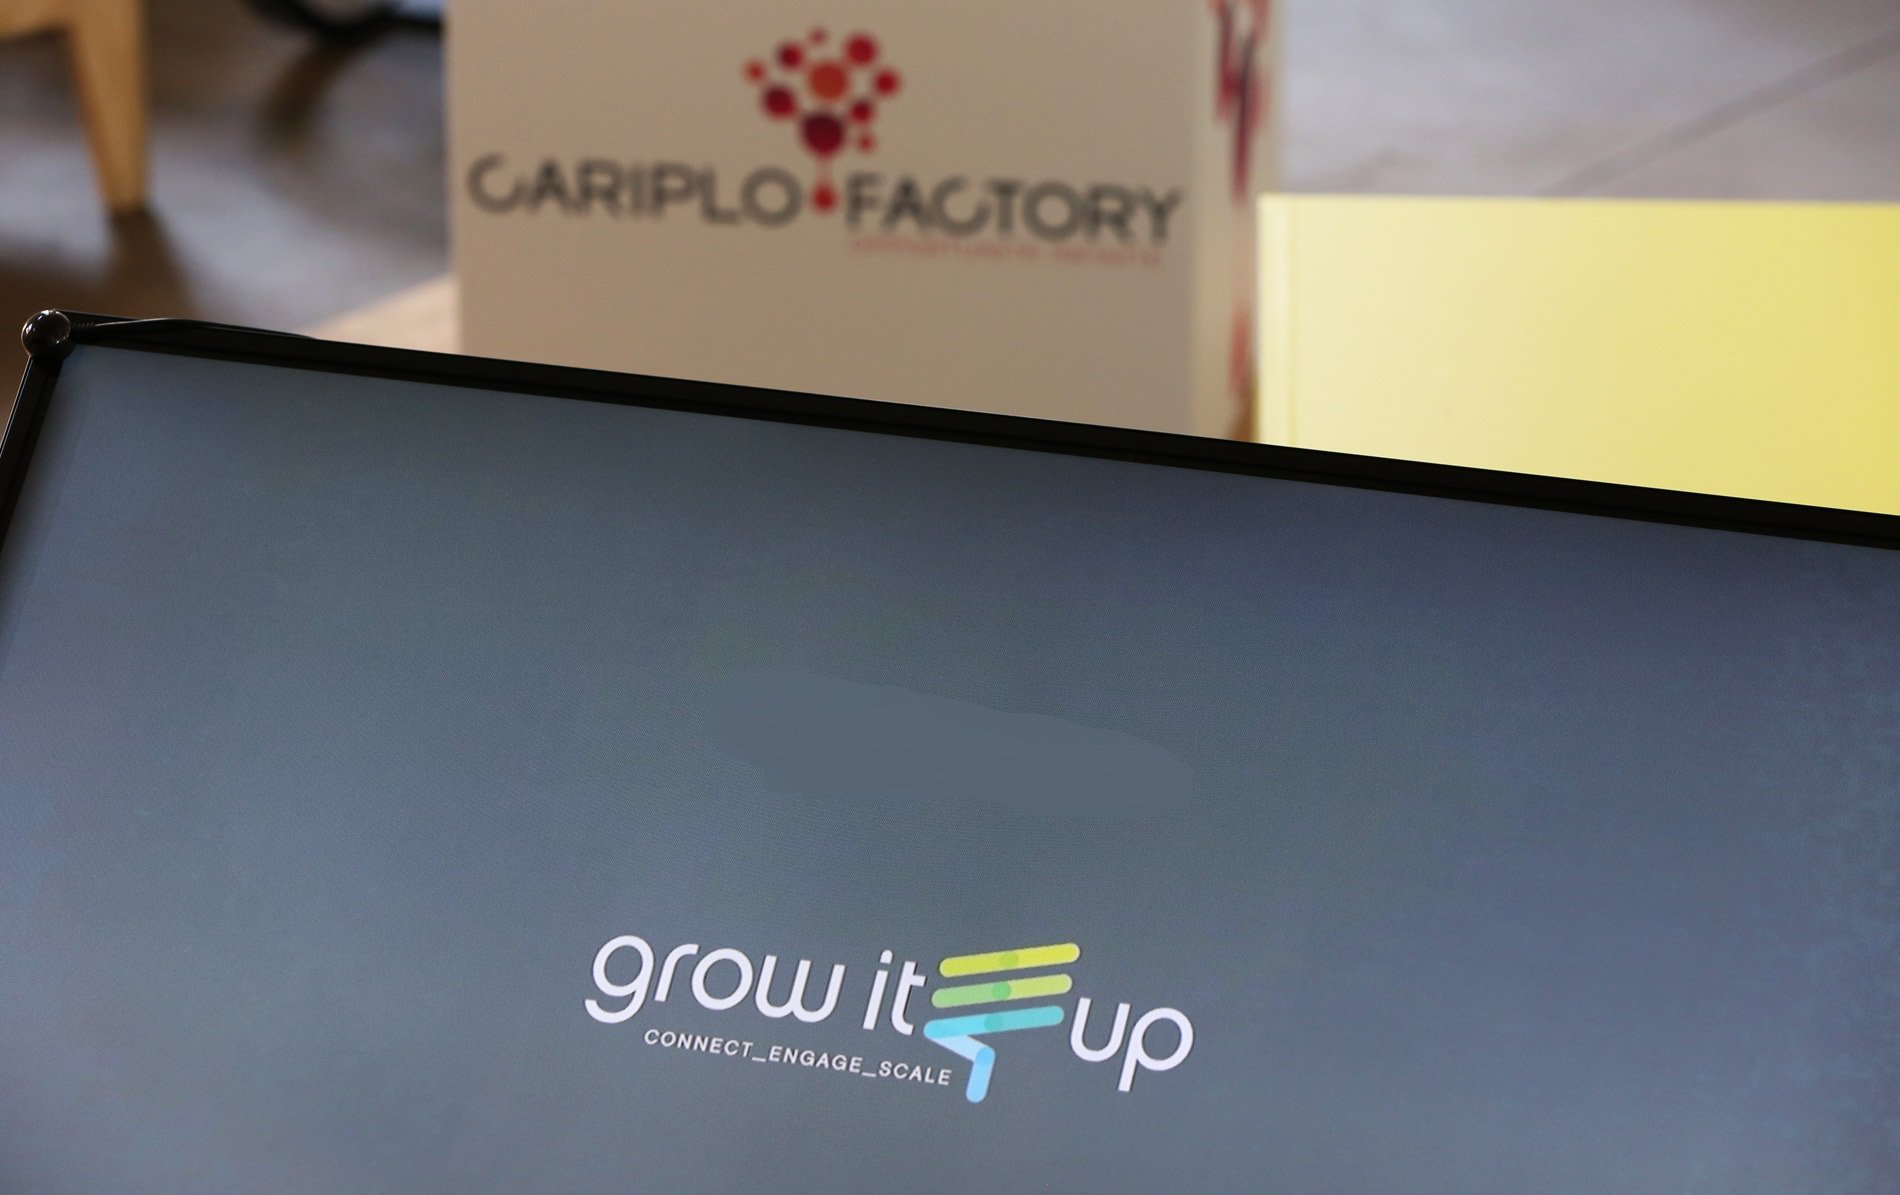 growitup_01-1